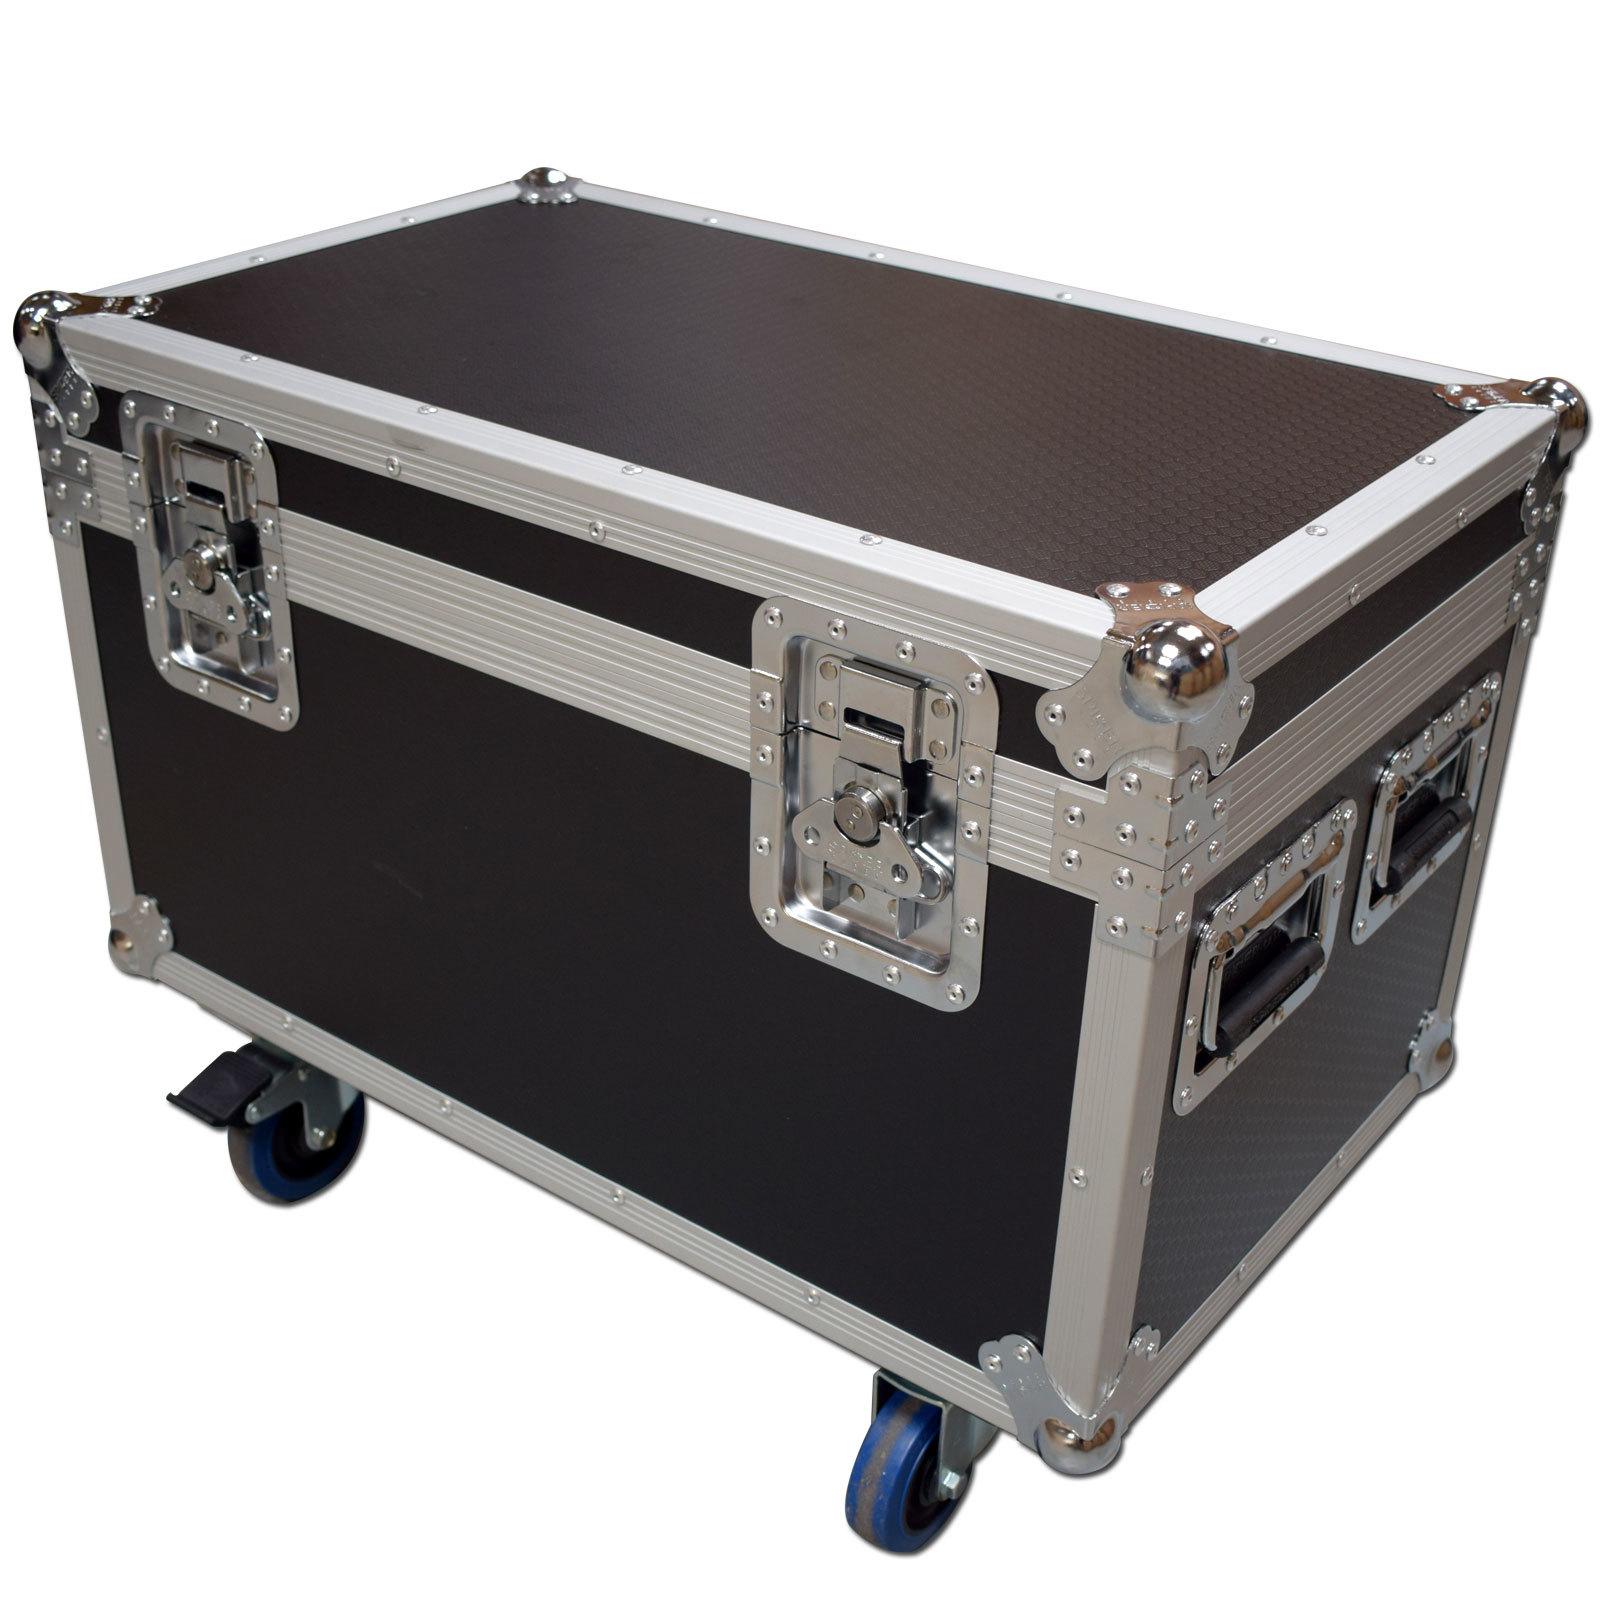 spider cable trunk road trunk flight case 700mm. Black Bedroom Furniture Sets. Home Design Ideas